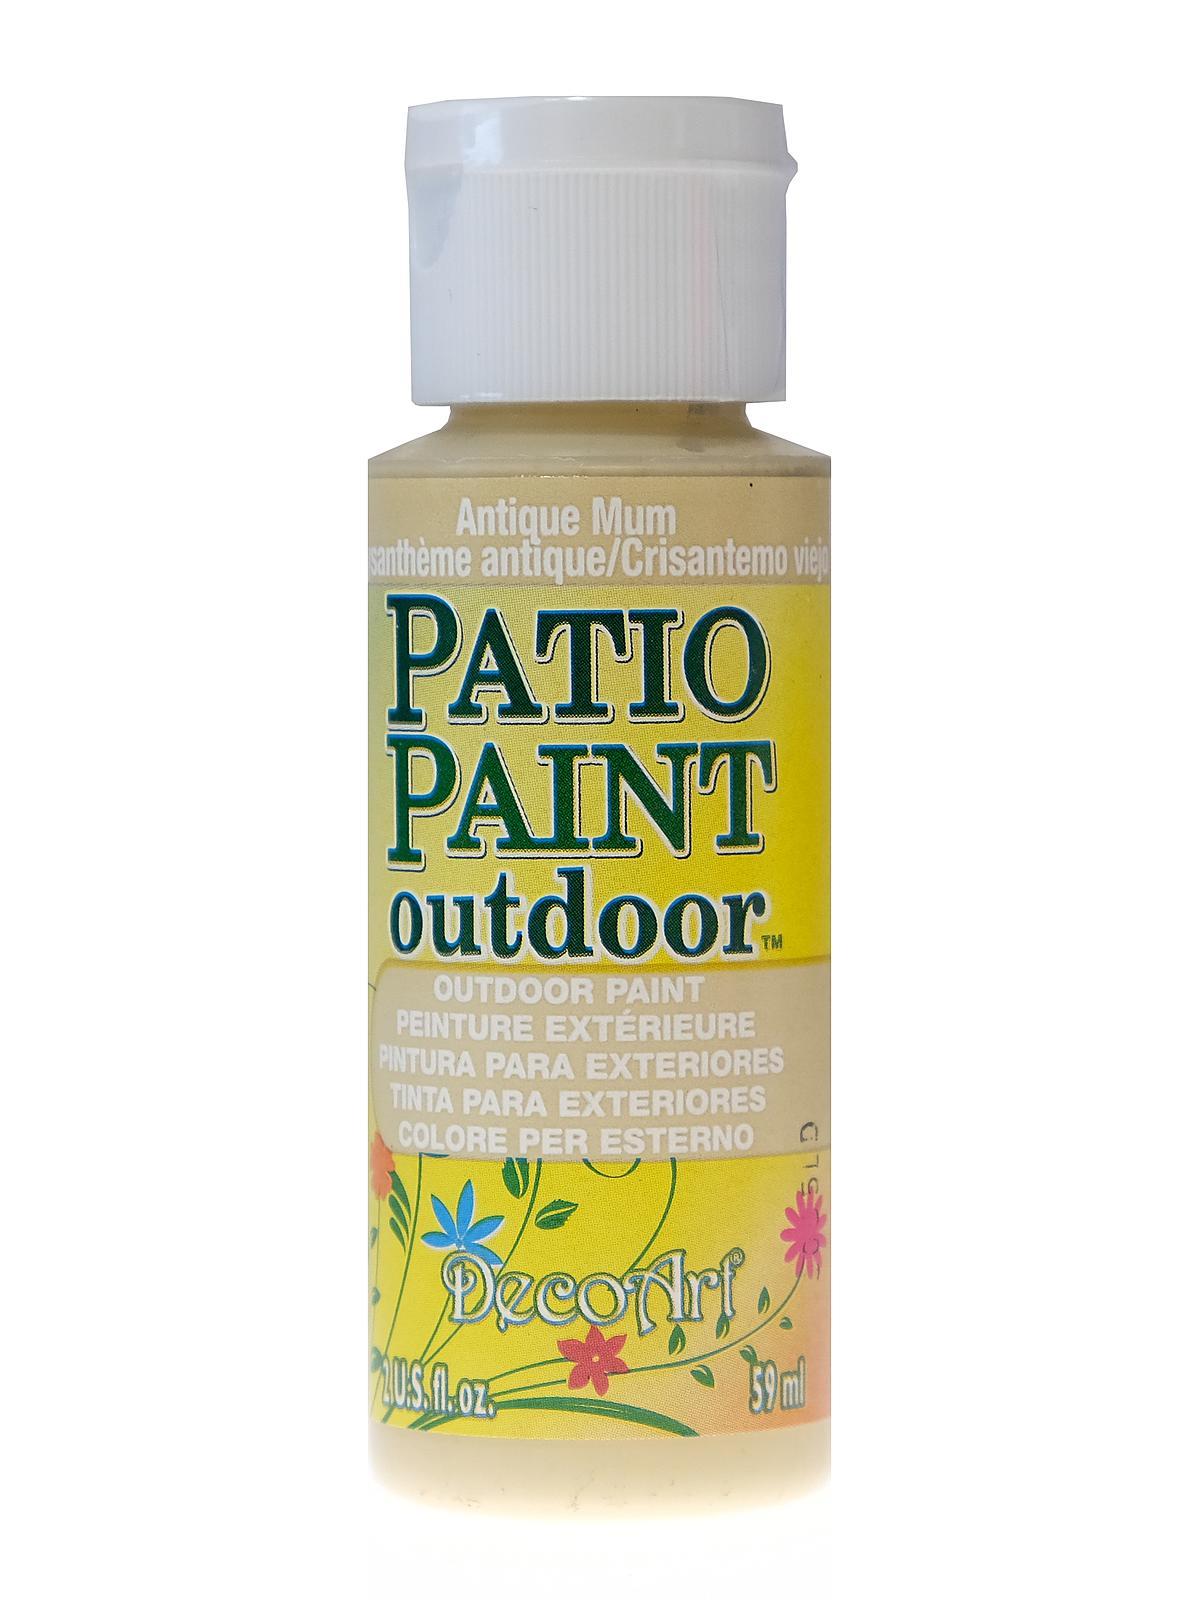 Patio Paint Antique Mum 2 Oz